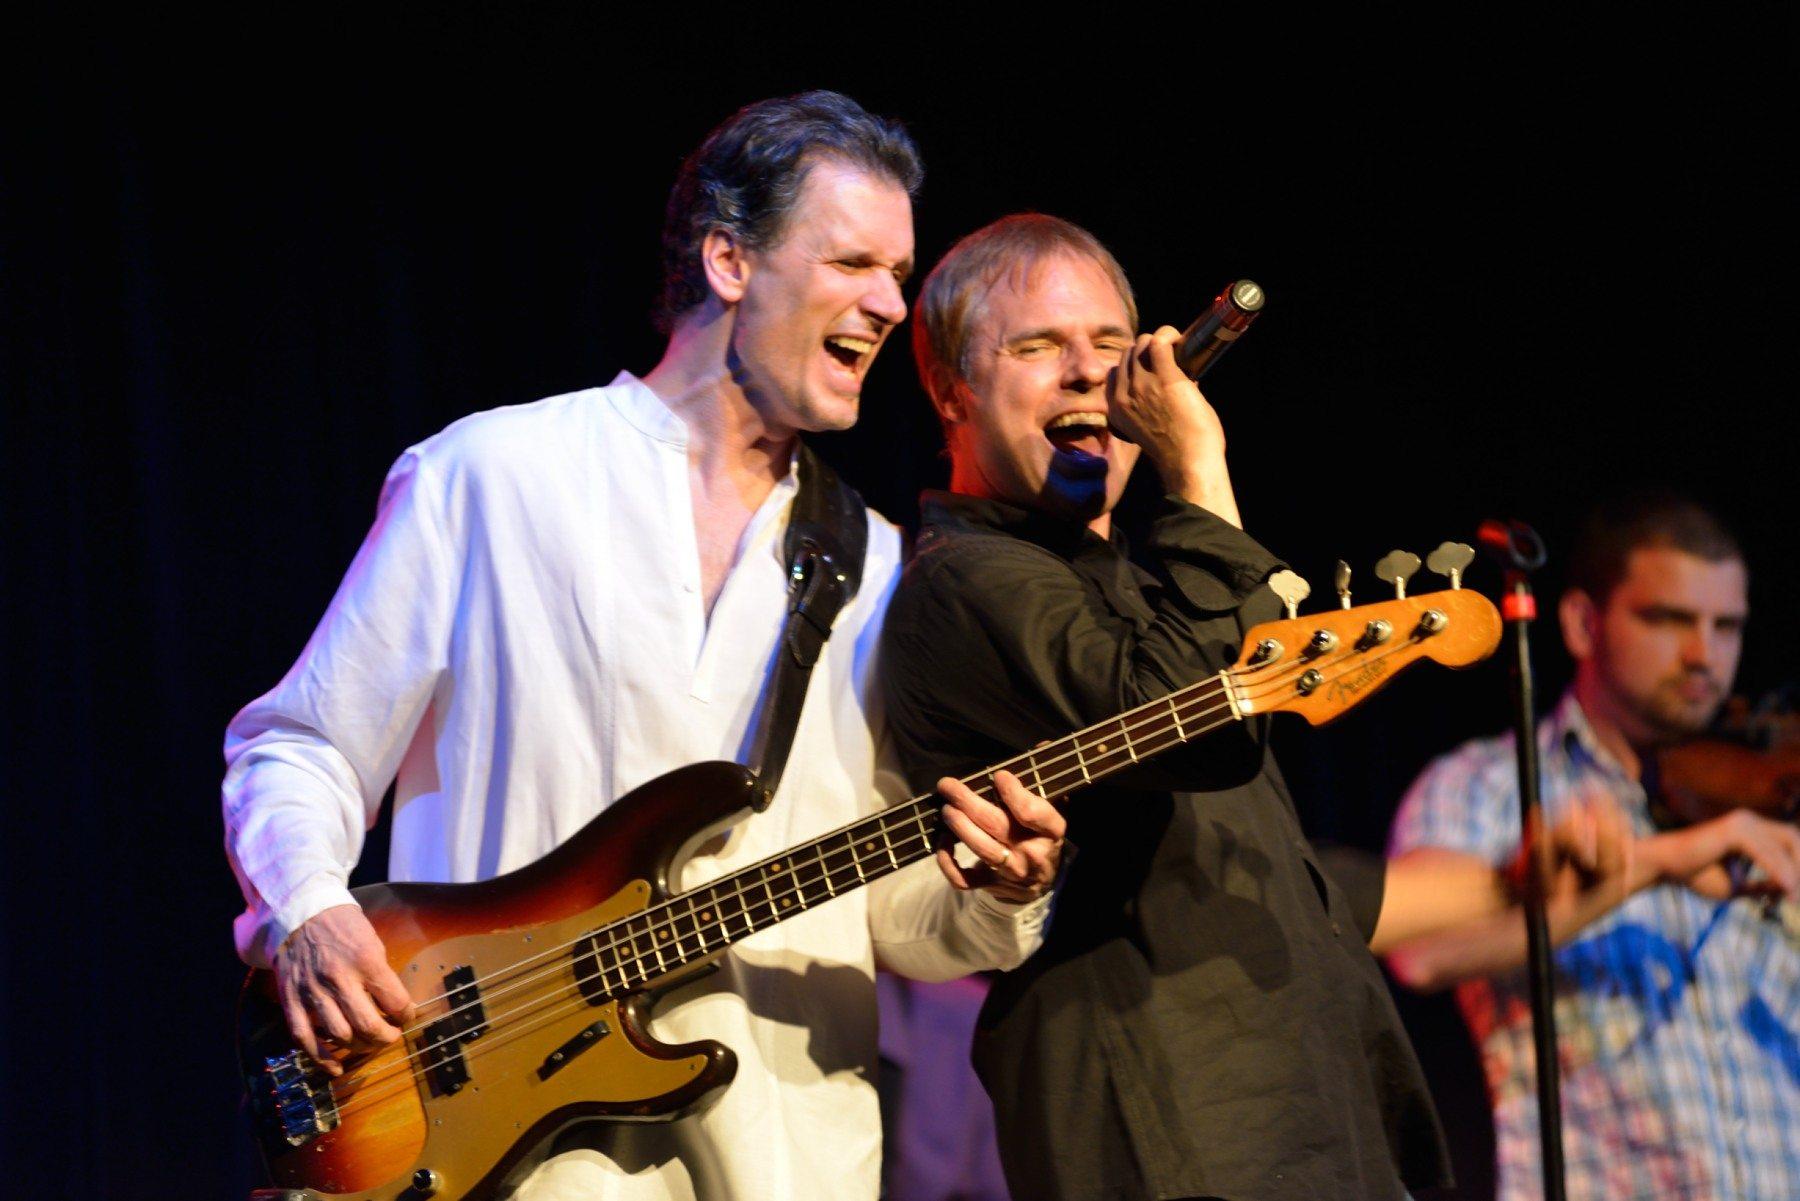 Mike Flynn and Steve Taylor